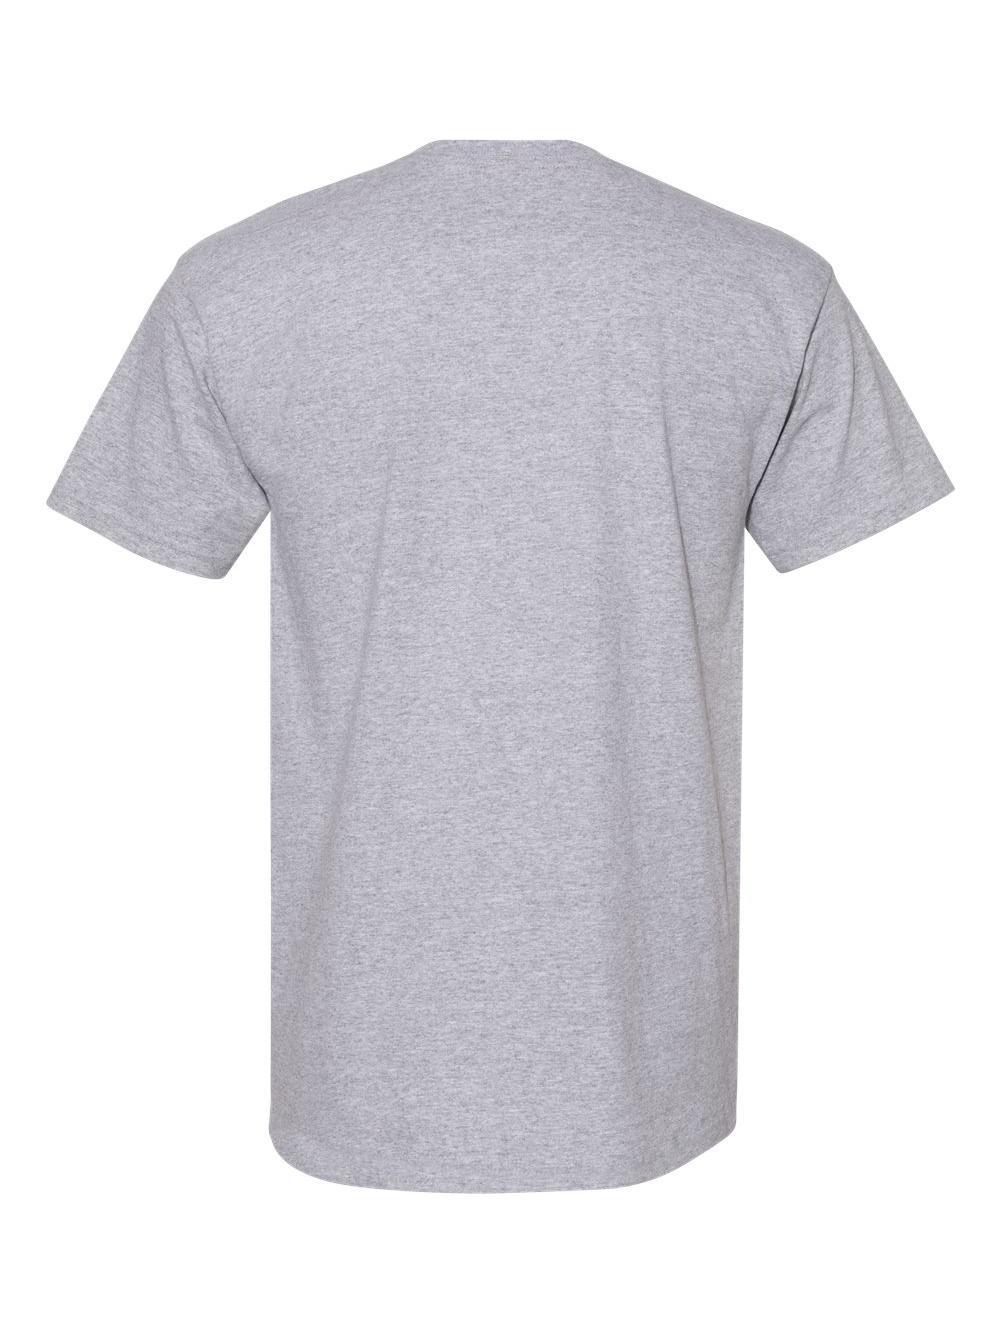 ALSTYLE-Premium-T-Shirt-1701 thumbnail 4